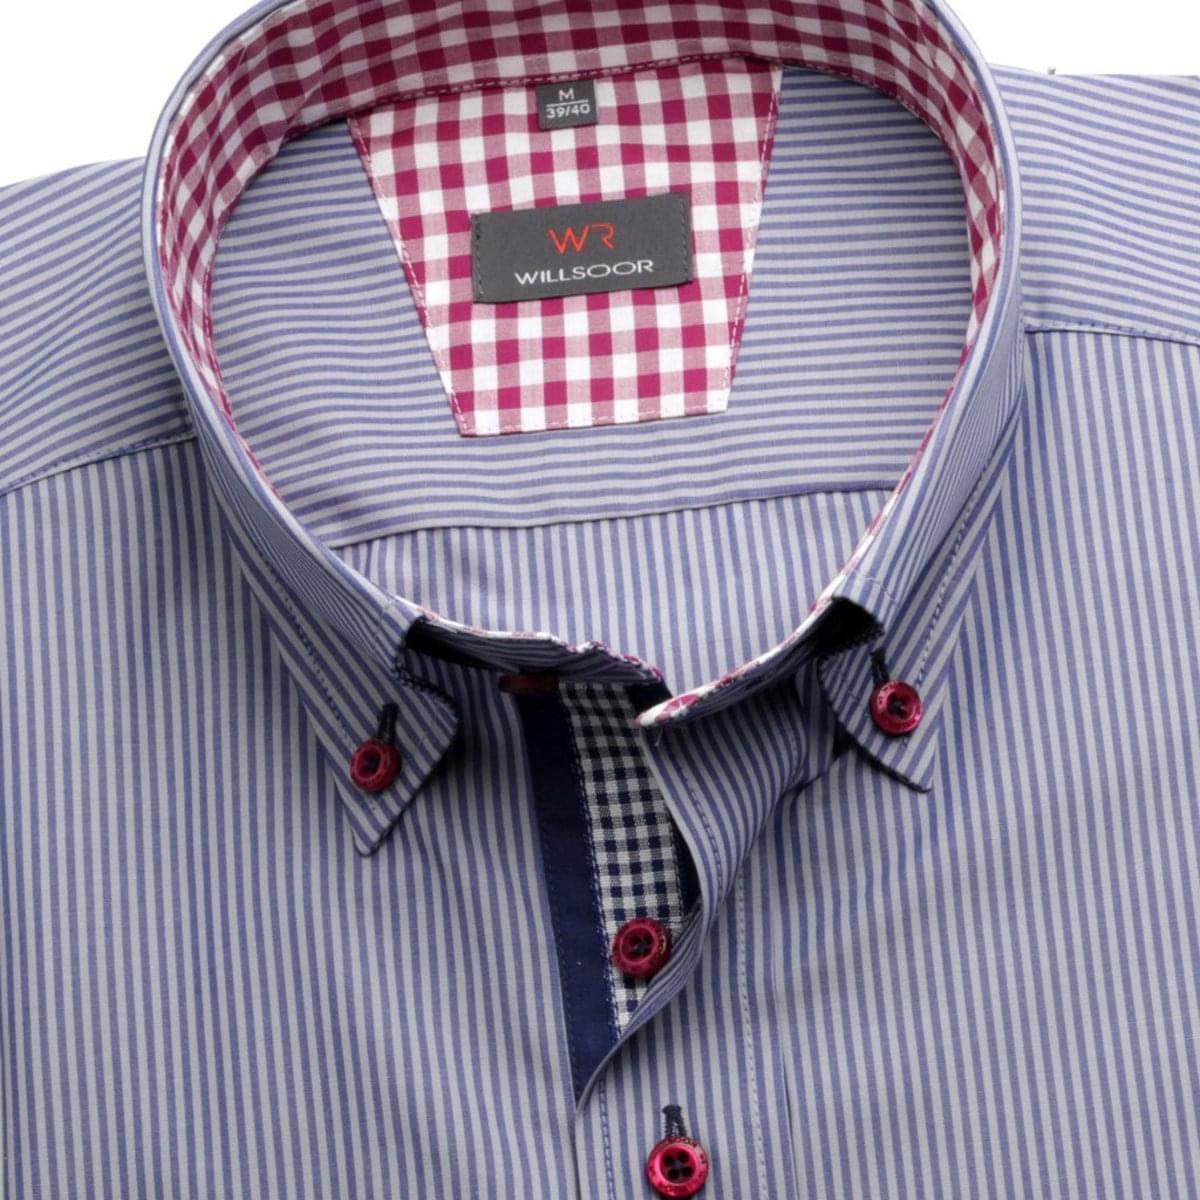 Willsoor Pánská košile WR Slim Fit (výška 176-182) 1974 176-182 / M (39/40)